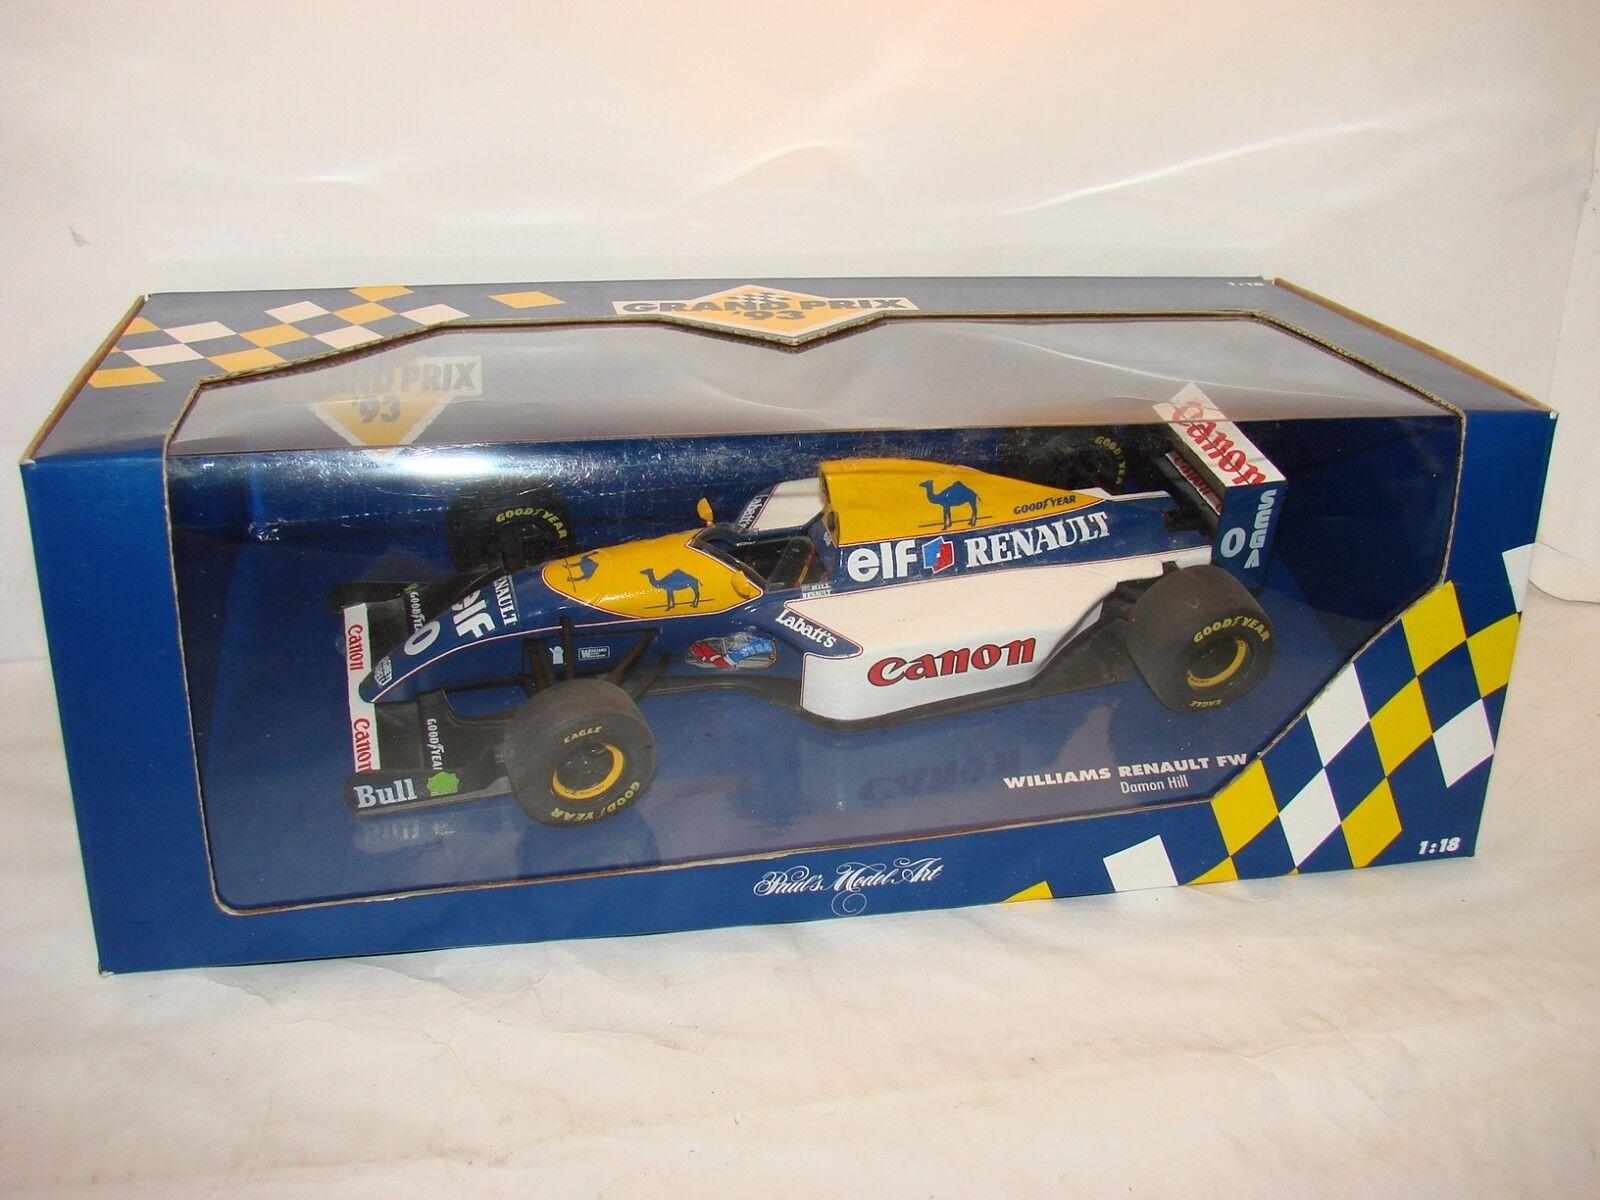 1   18 Williams - Renault Team 15, Temporada 1993, Damone Hill, campeón bnib